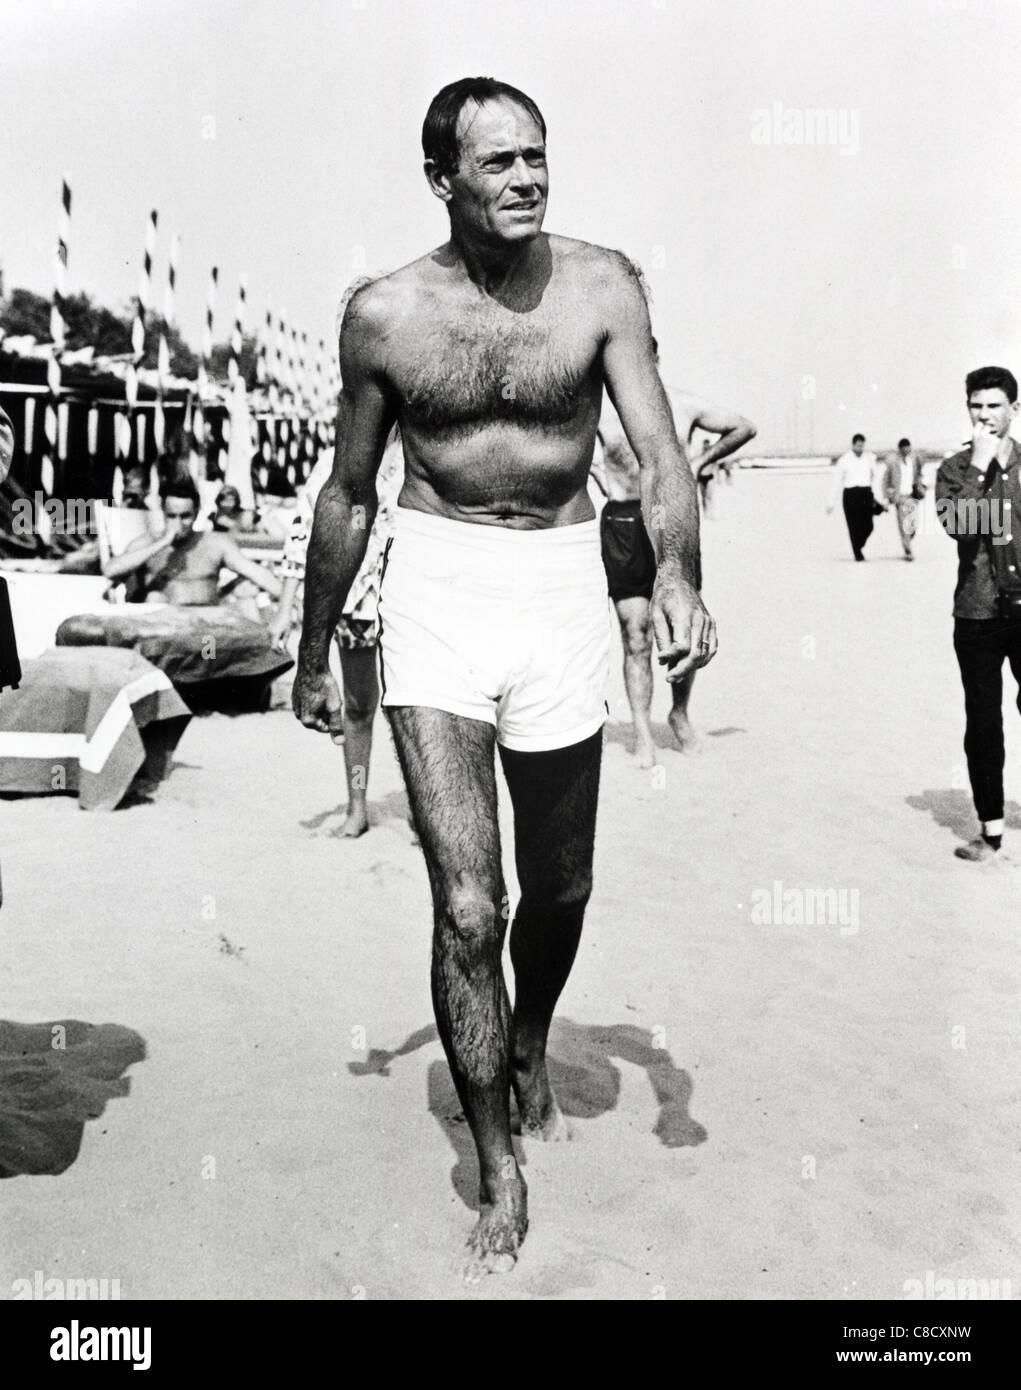 HENRY FONDA SCHAUSPIELER (1955) Stockbild